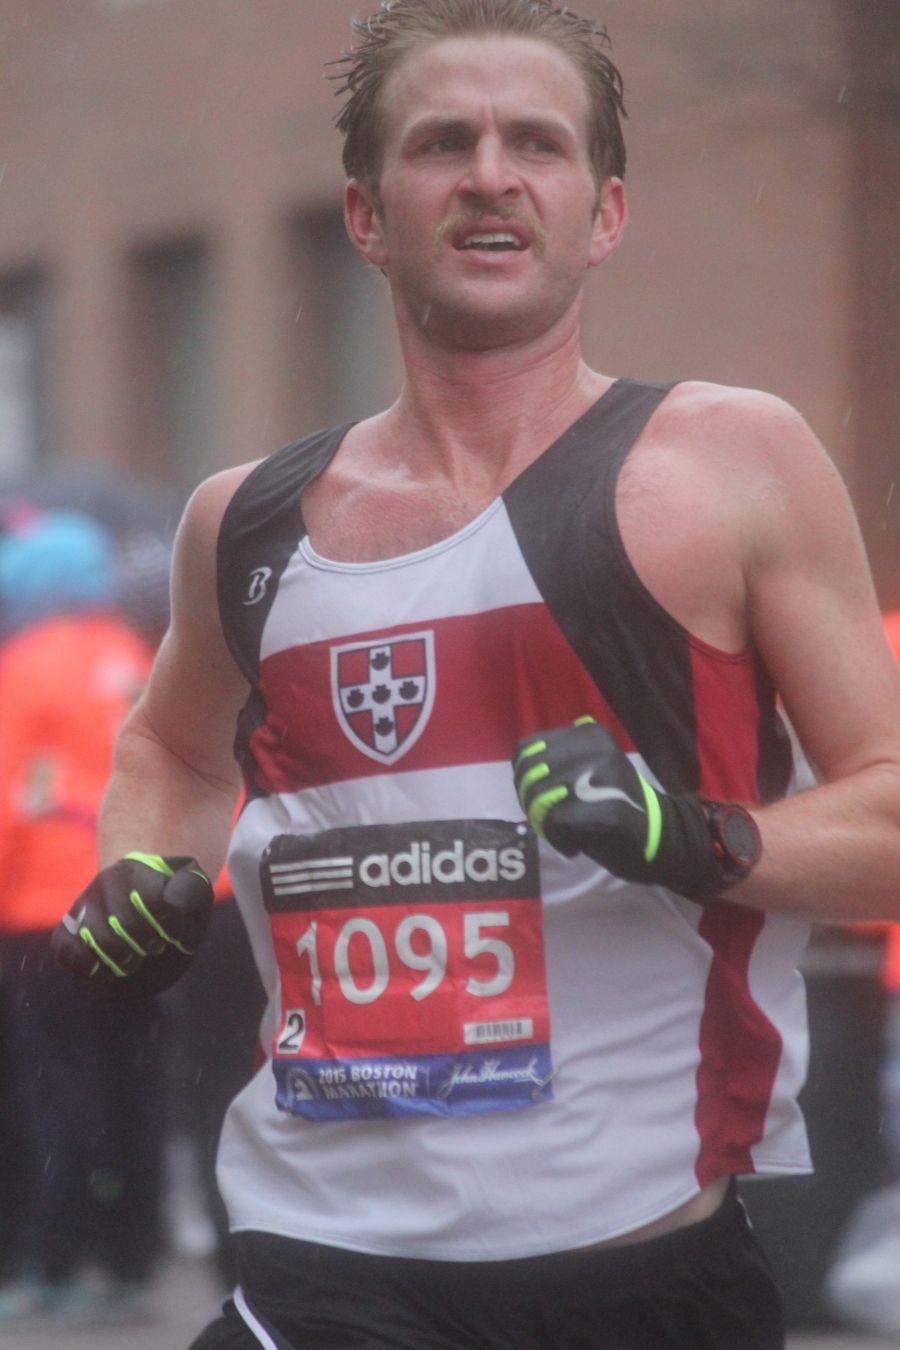 boston marathon april 20 2015 racer number 1095